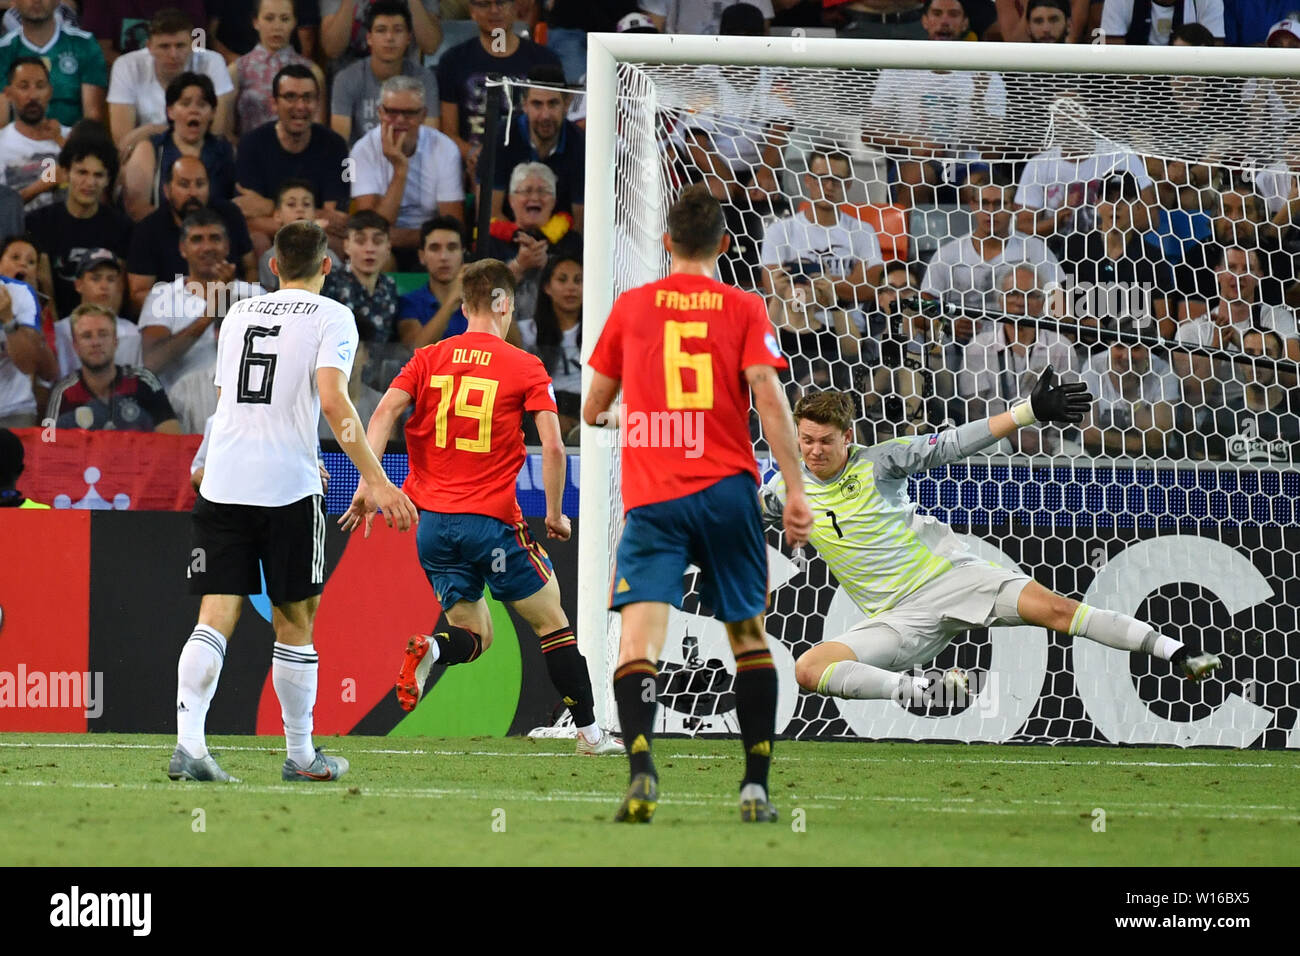 Udine, Italien. 30th June, 2019. goal to 2-0 by Dani OLMO (ESP, 19), action, goal shot versus Alexander NUEBEL, goalkeeper (GER). Spain (ESP) - Germany (GER) 2-1, at 30.06.2019 Stadio Friuli Udine. Football U-21, FINALE UEFA Under21 European Championship in Italy/SanMarino from 16.-30.06.2019. | Usage worldwide Credit: dpa/Alamy Live News - Stock Image